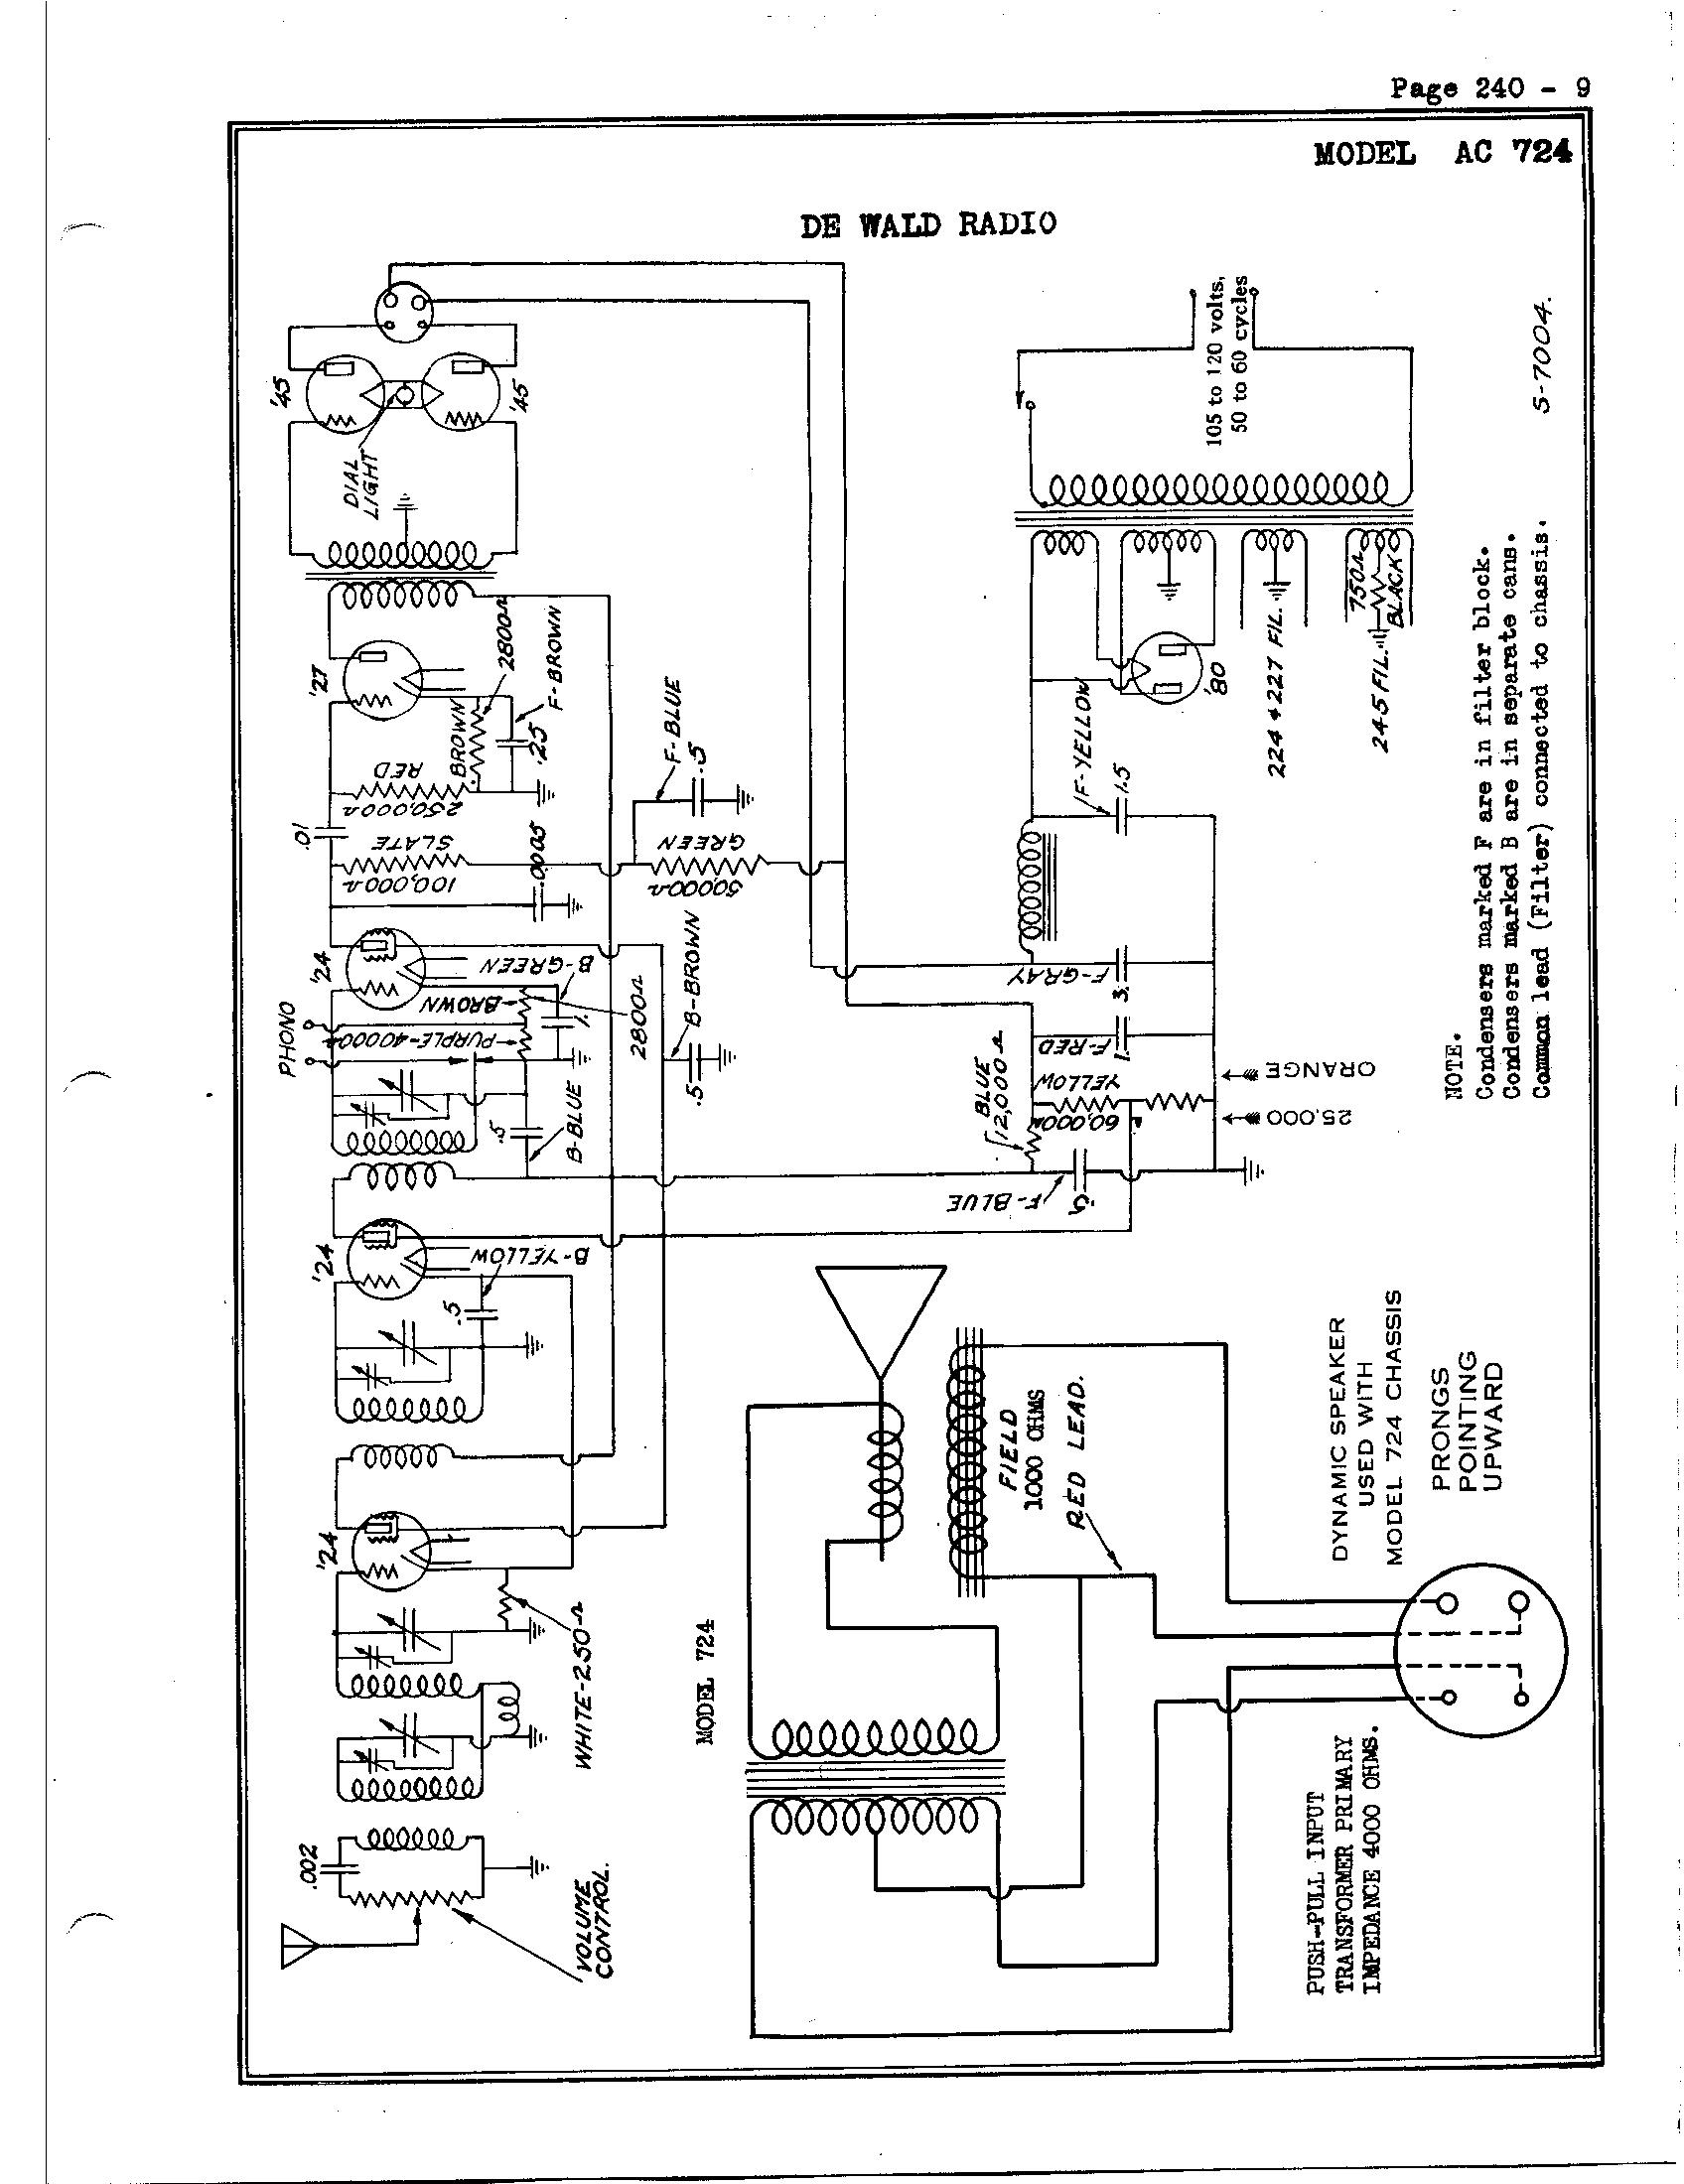 Dewald Radio Mfg Corp 724